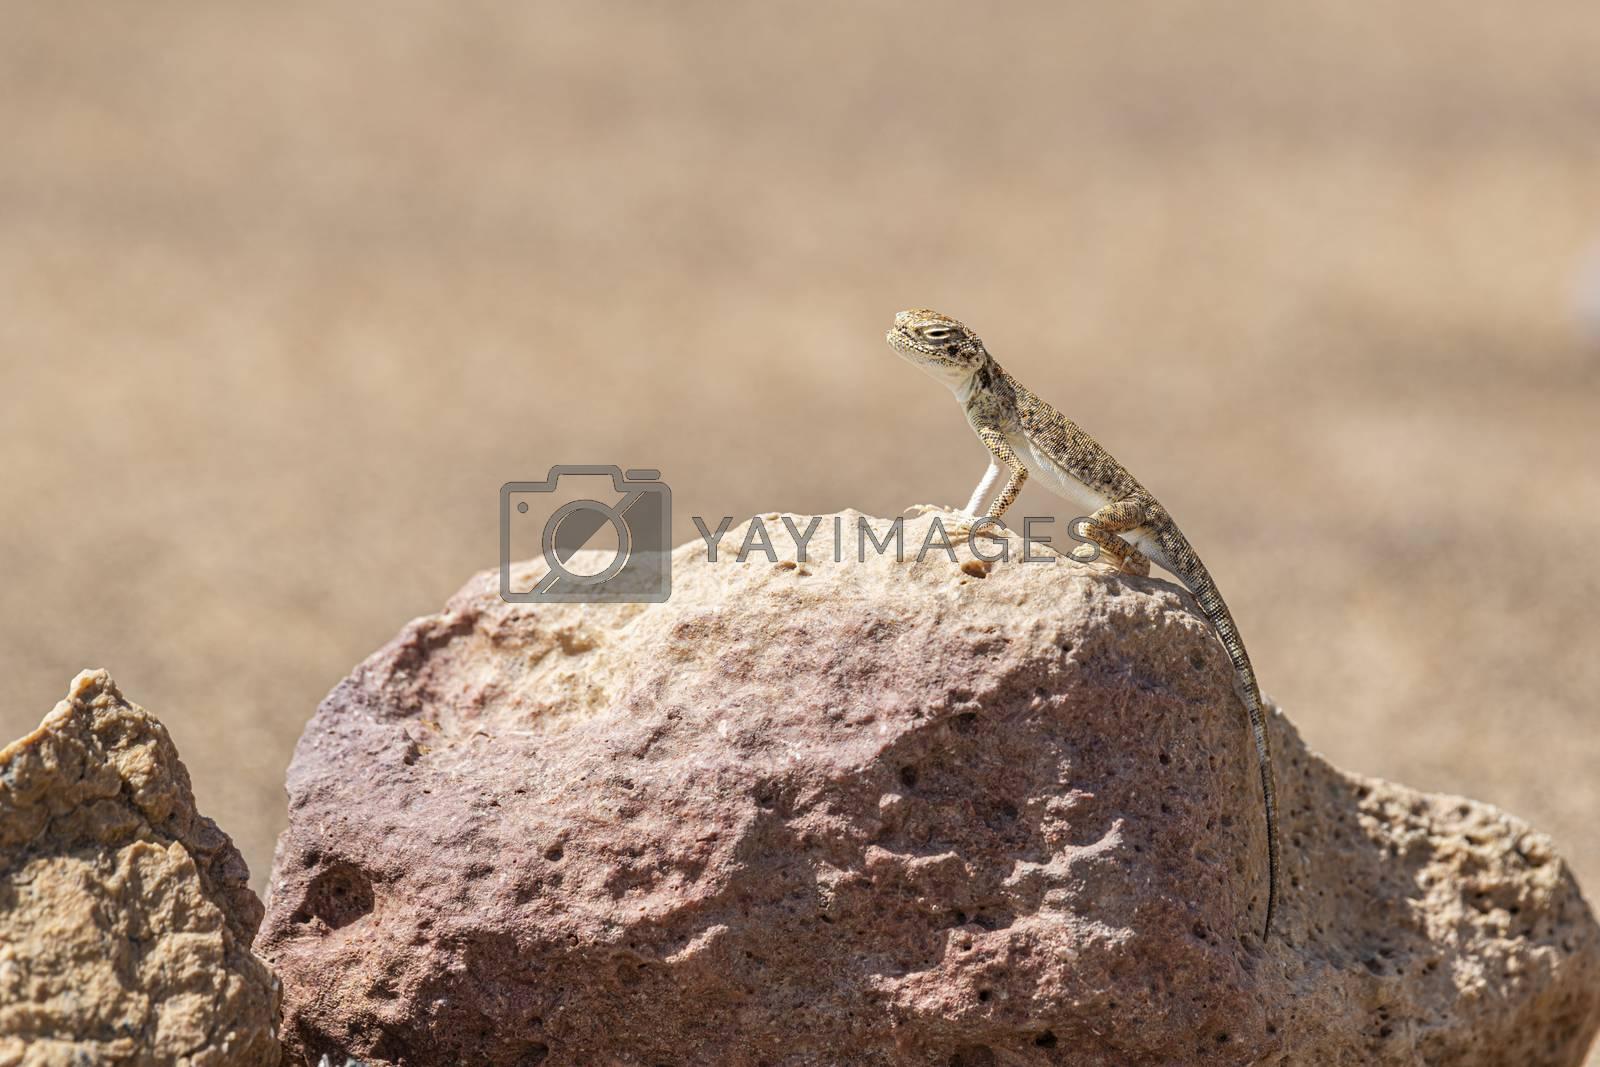 Close-up of Arabian toad-headed agama (Phrynocephalus arabicus) in the Desert, stanbding on a stone, Sharjah, United Arab Emirates (UAE), Arabian Peninsula, Middle East